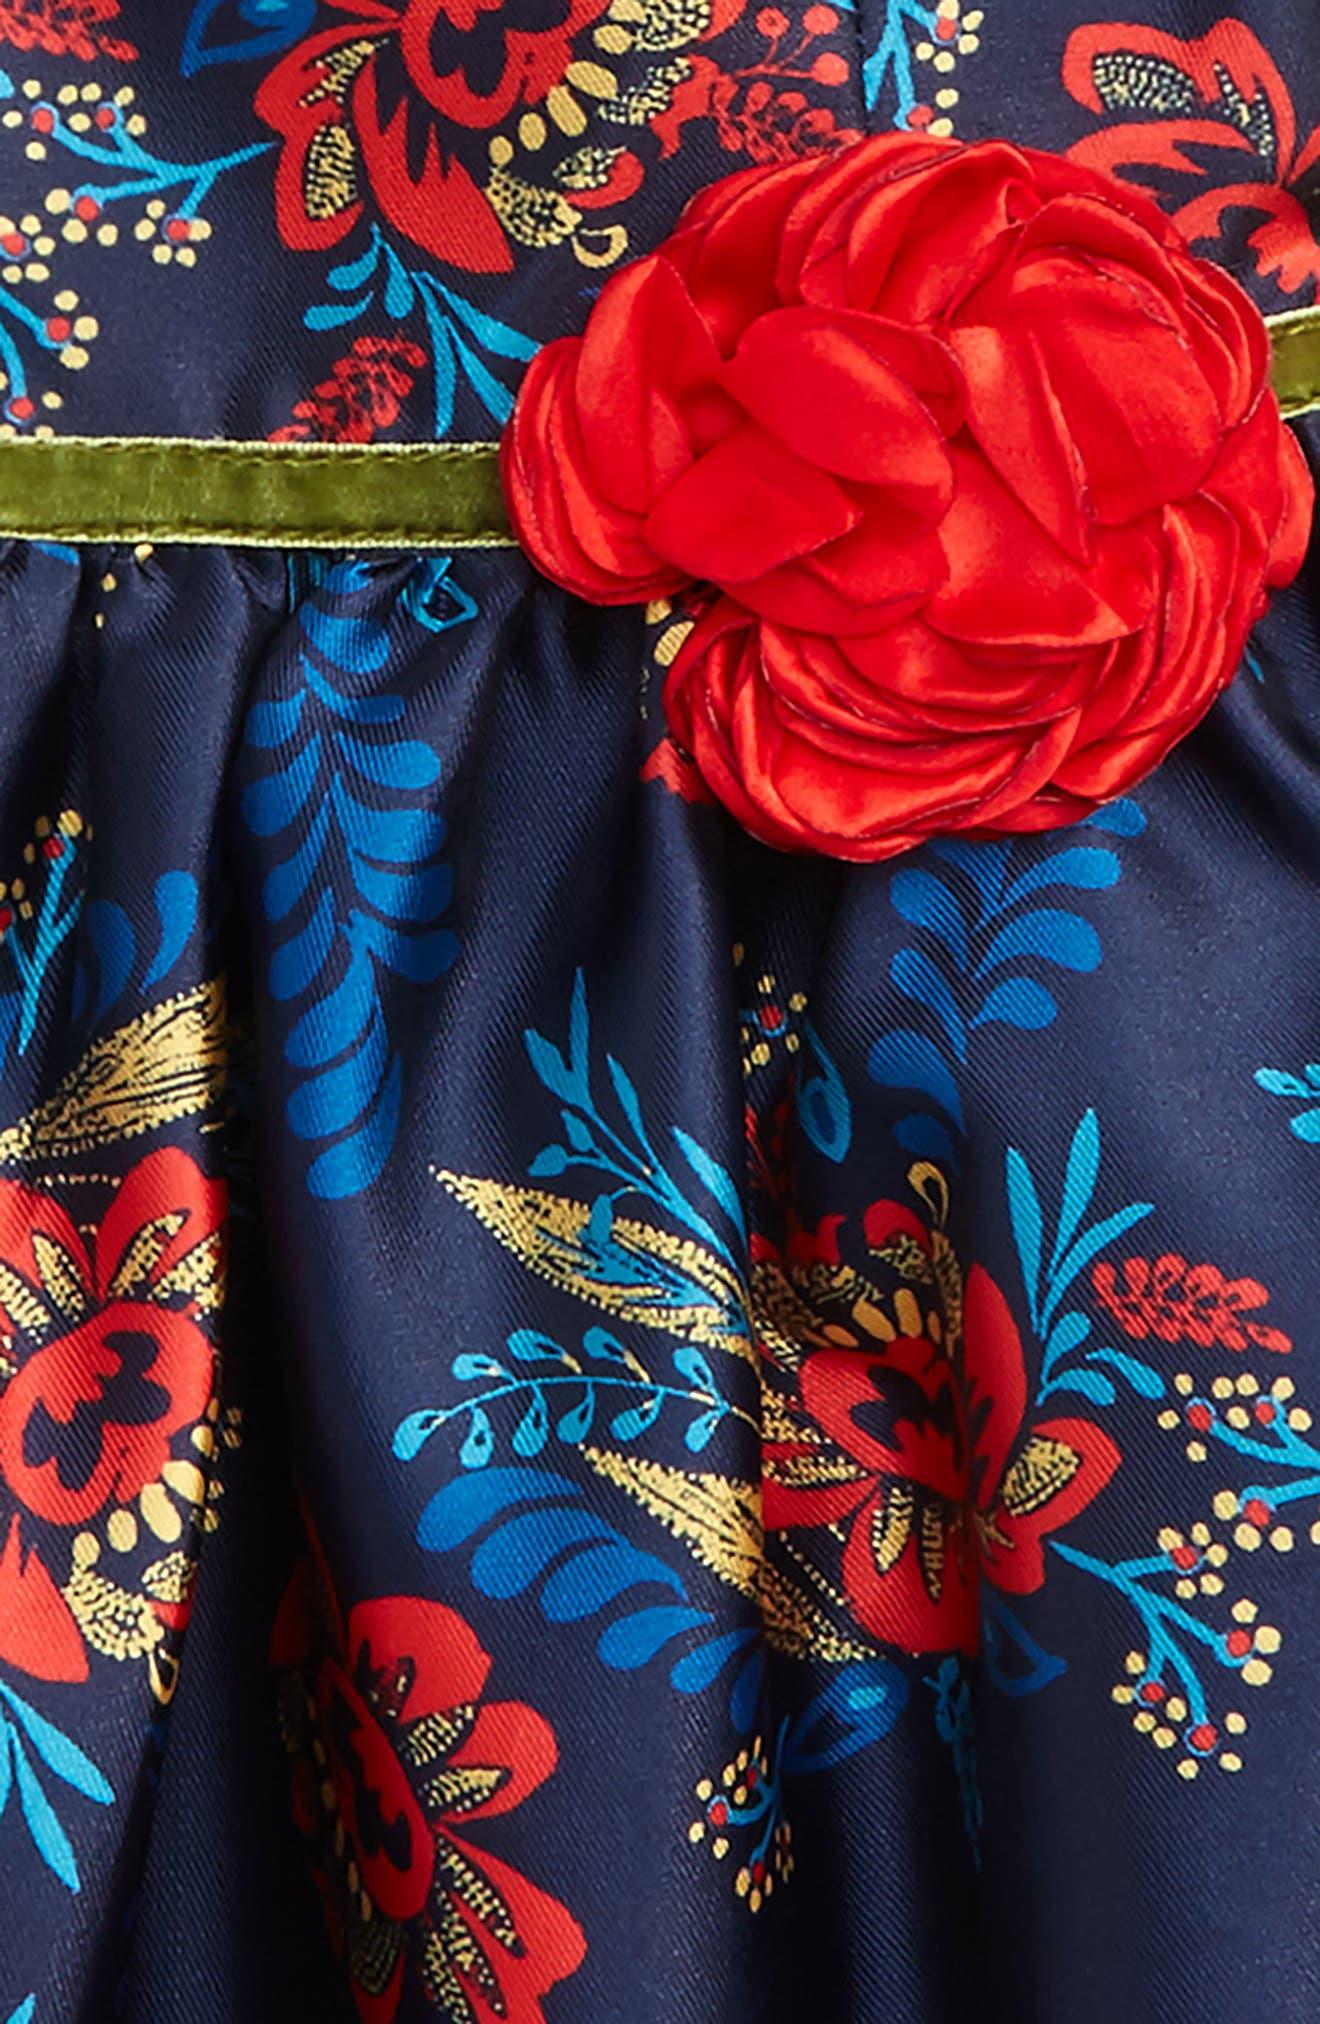 Floral Print Fit & Flare Dress,                             Alternate thumbnail 2, color,                             415